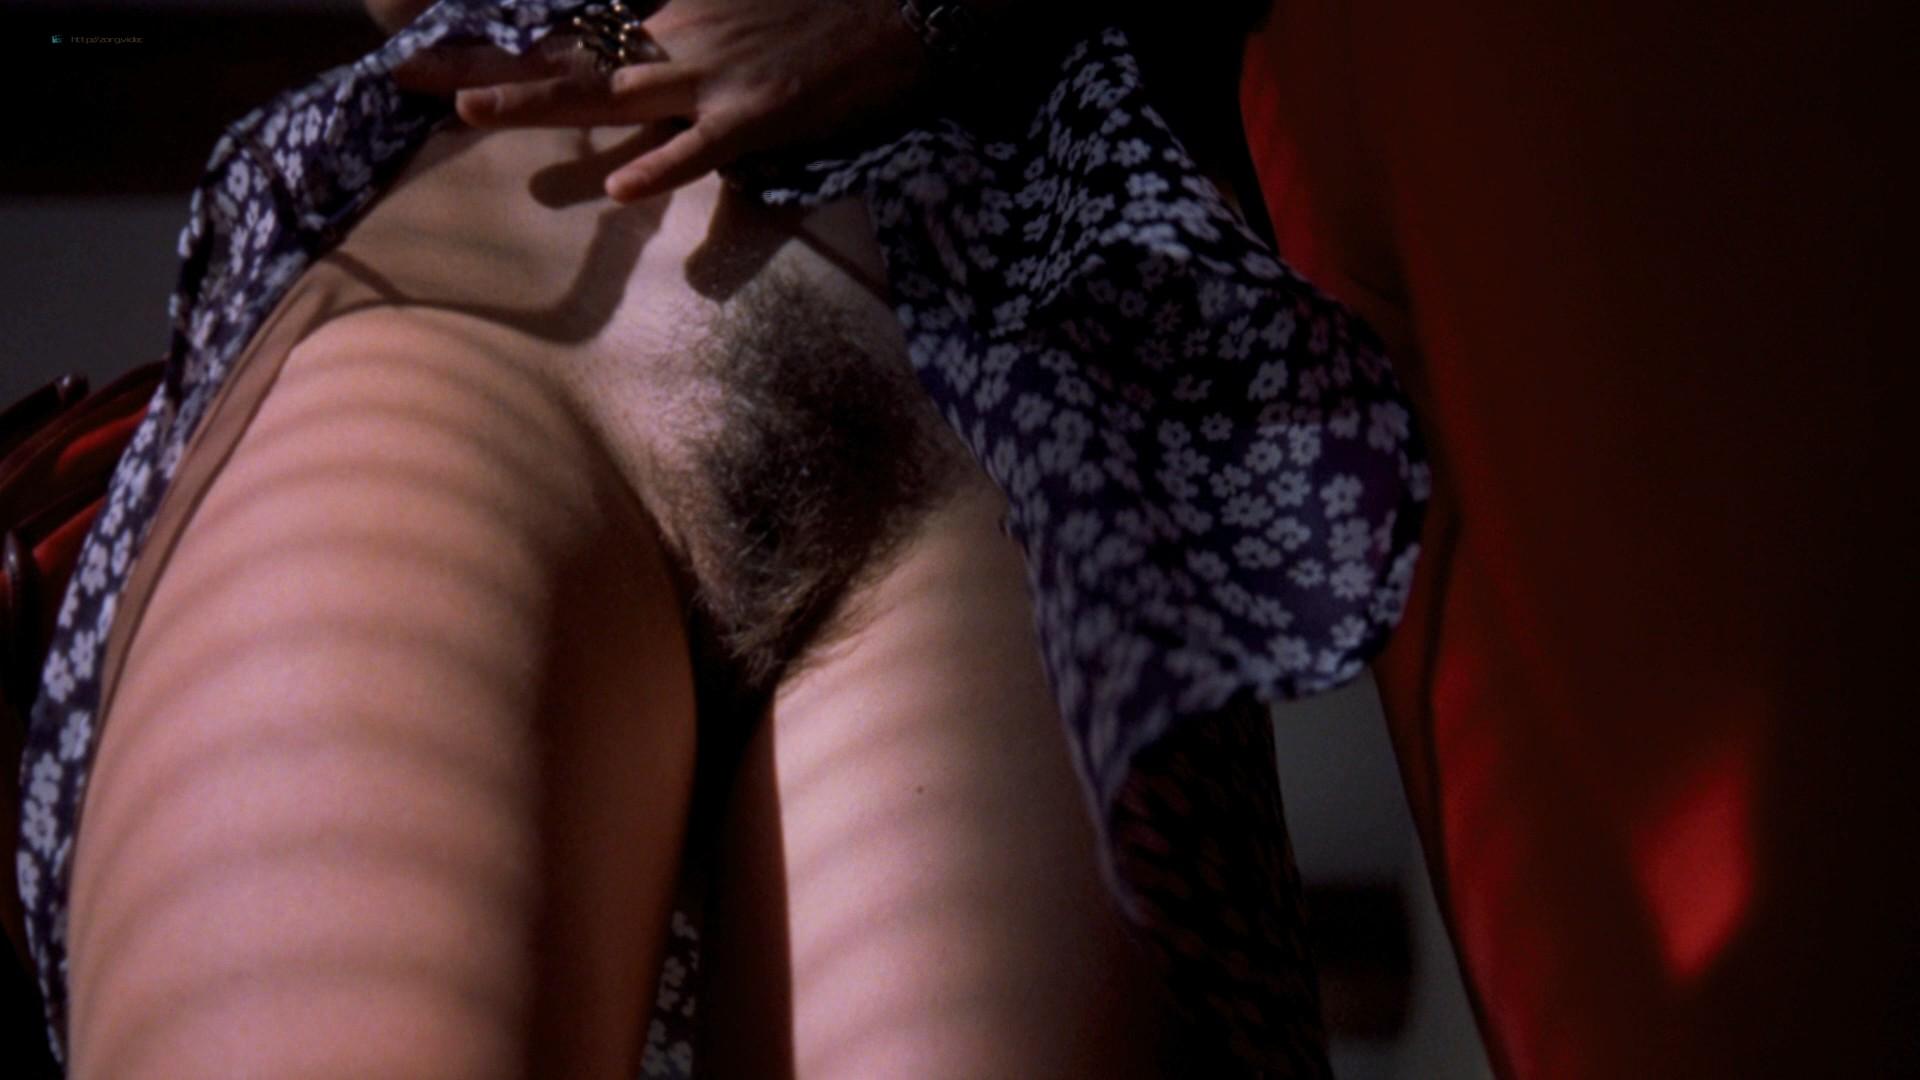 Yuliya Mayarchuk nude sex explicit Francesca Nunzi, Leila Carli all nude - Trasgredire (2000) HD 1080p BluRay (24)